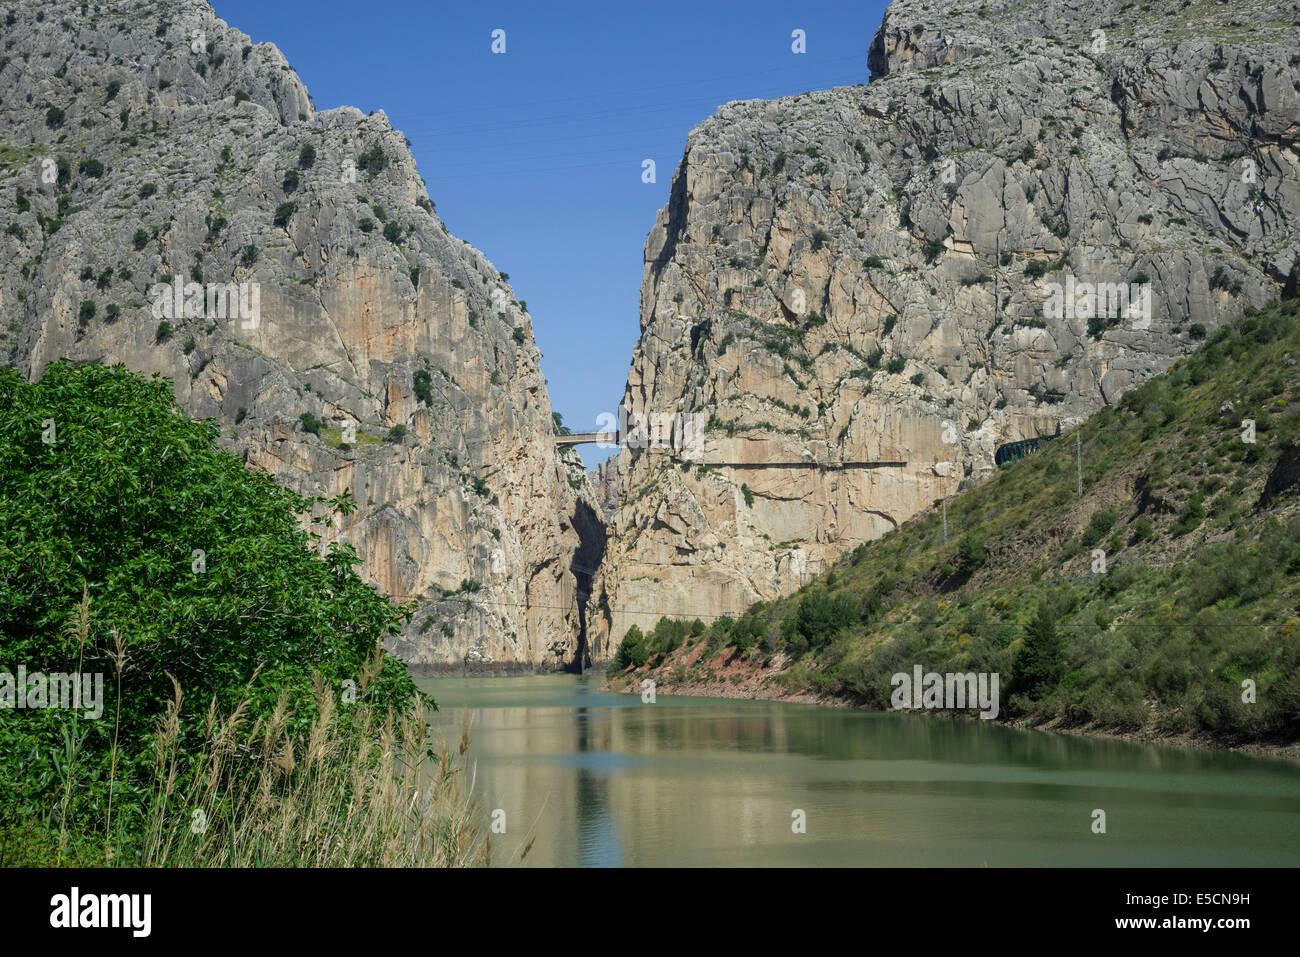 Klettersteig Caminito Del Rey : Rio guadalhorce mit caminito del rey via ferrata almunecar